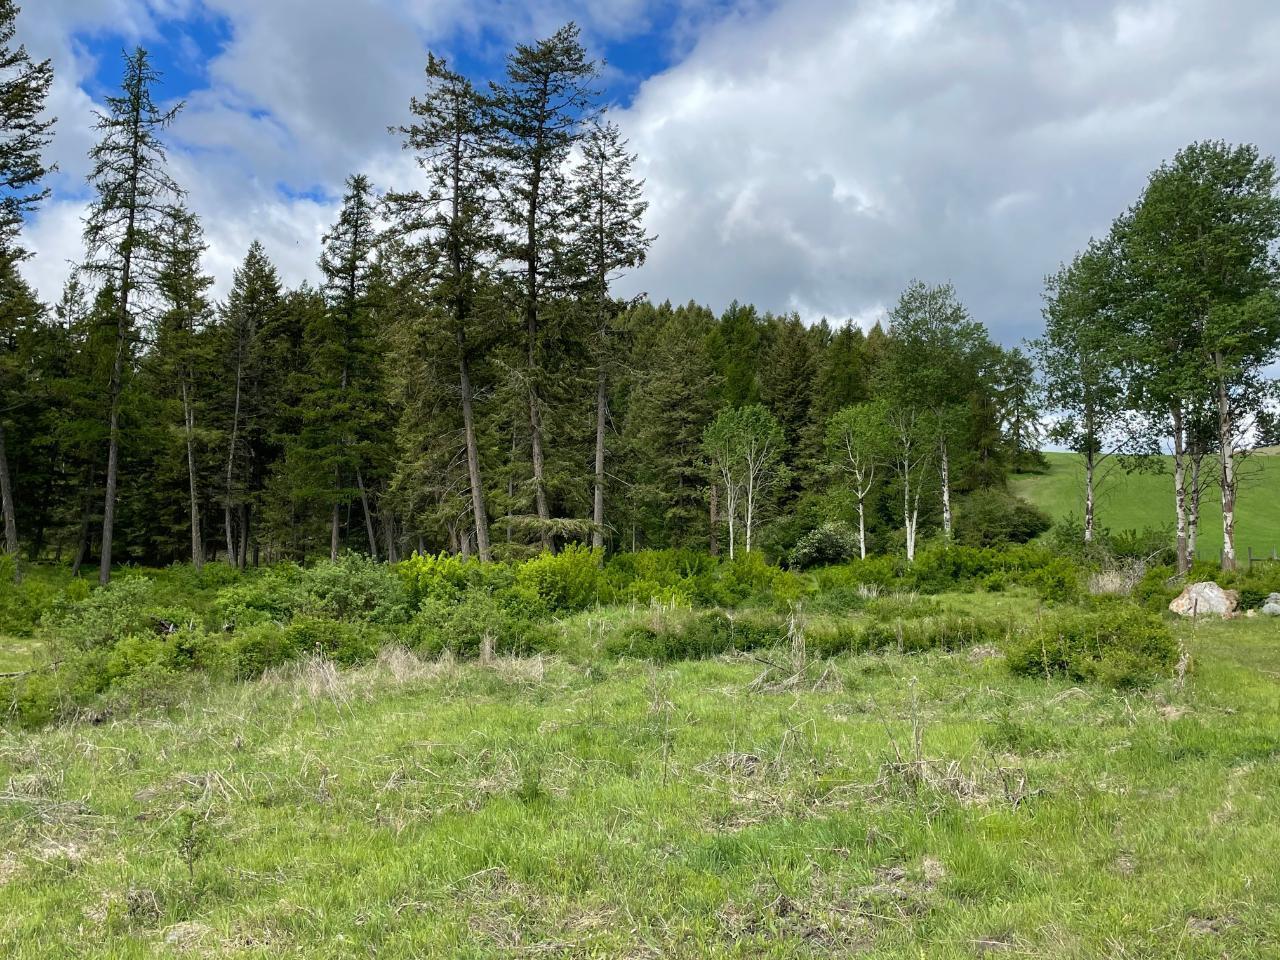 4685 Hwy 3,, Rock Creek/bridesville, British Columbia  V0H 1Y0 - Photo 56 - 189734